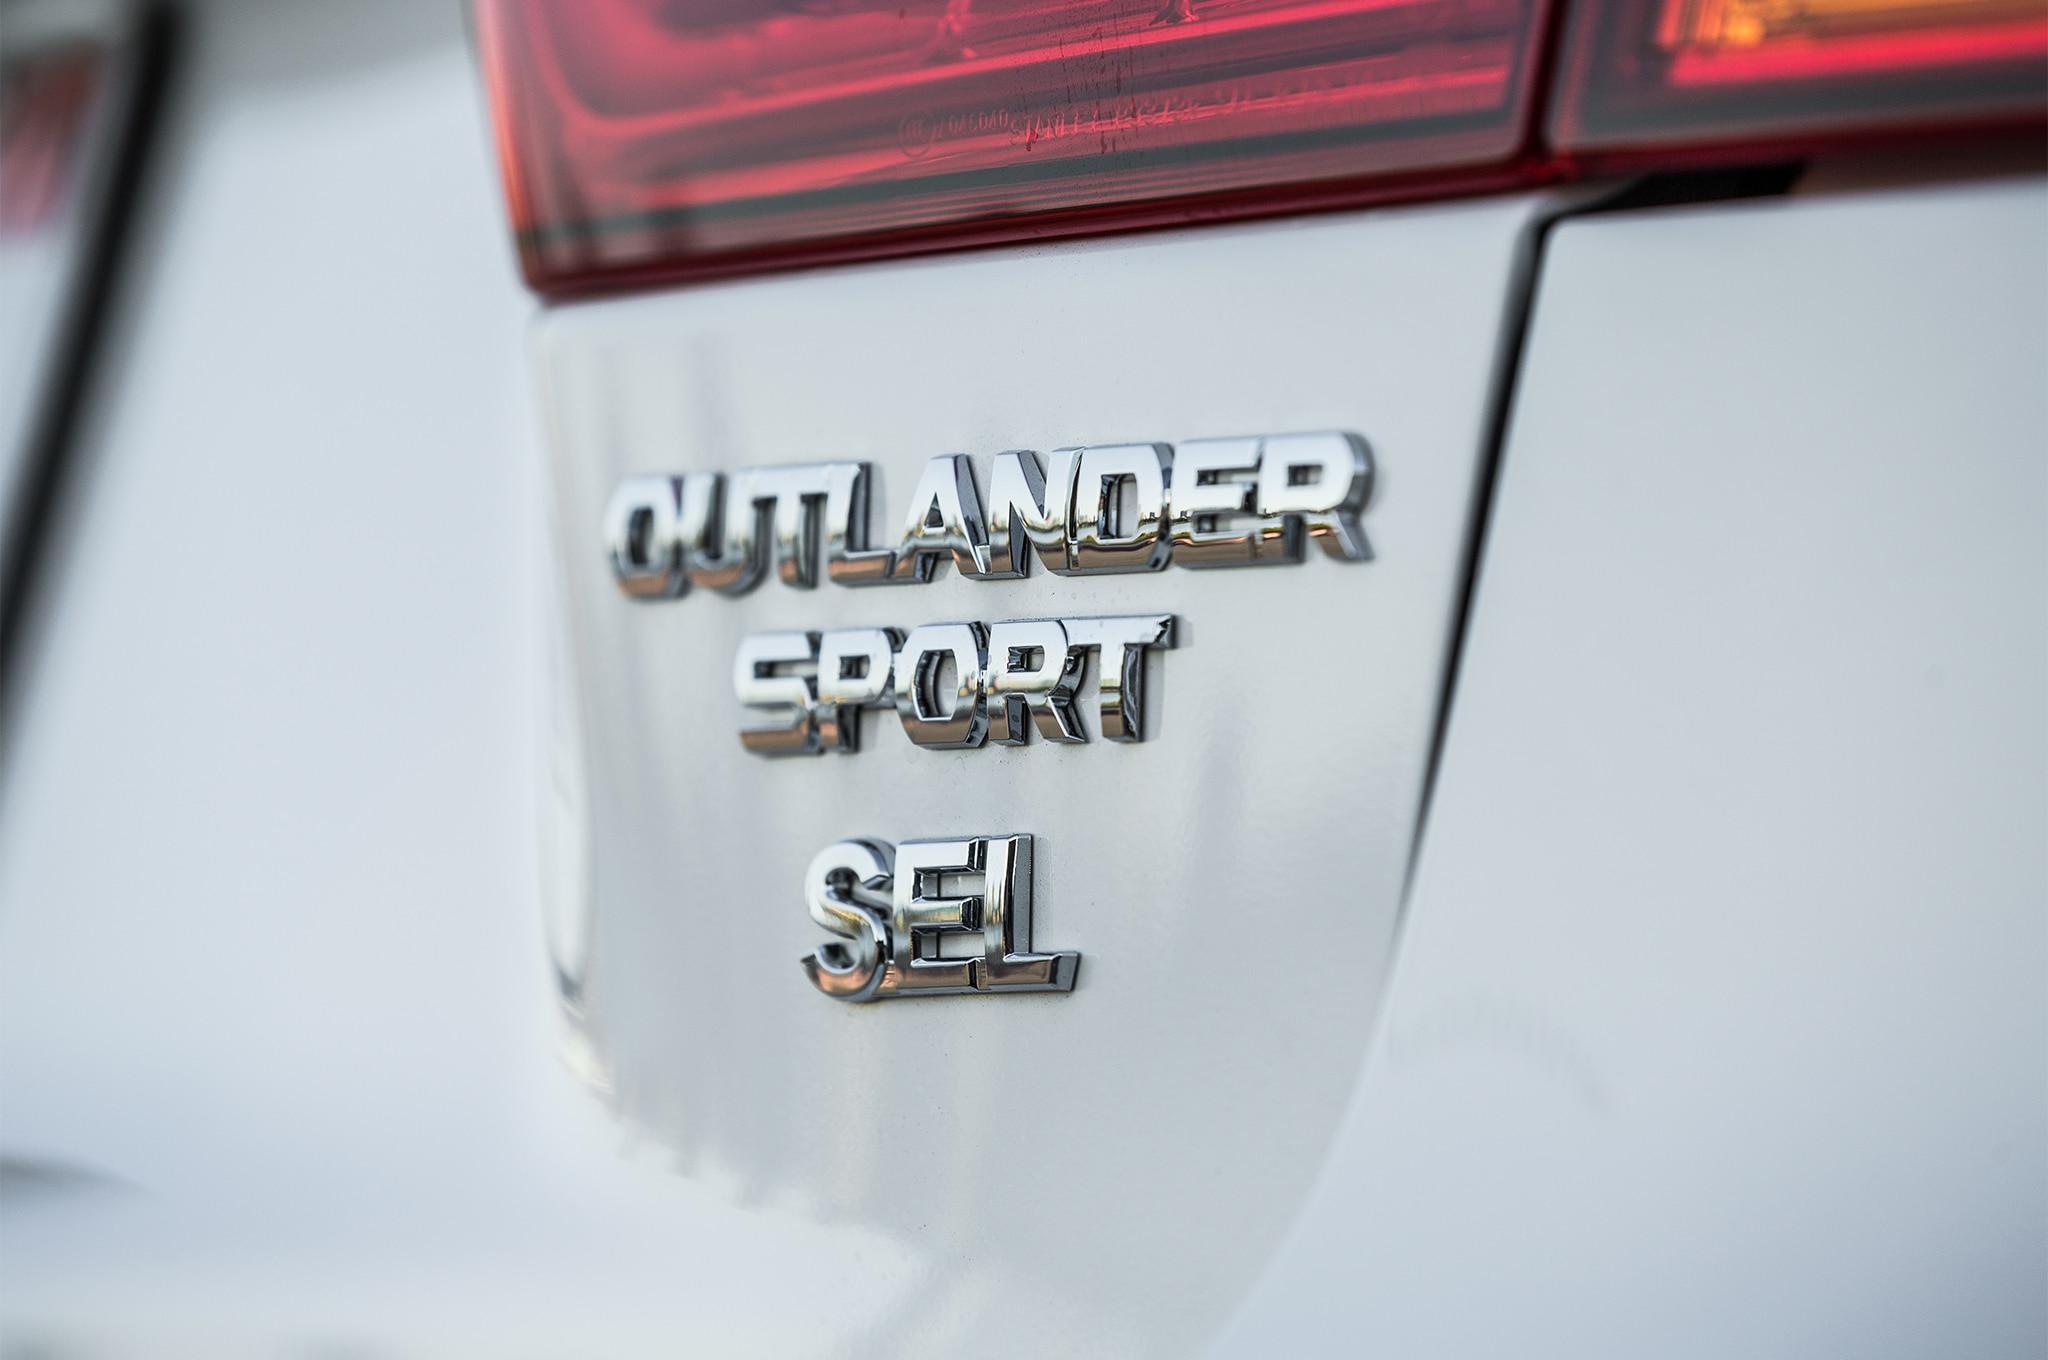 2018 Mitsubishi Outlander Sport 2 4 SEL AWC Quick Take